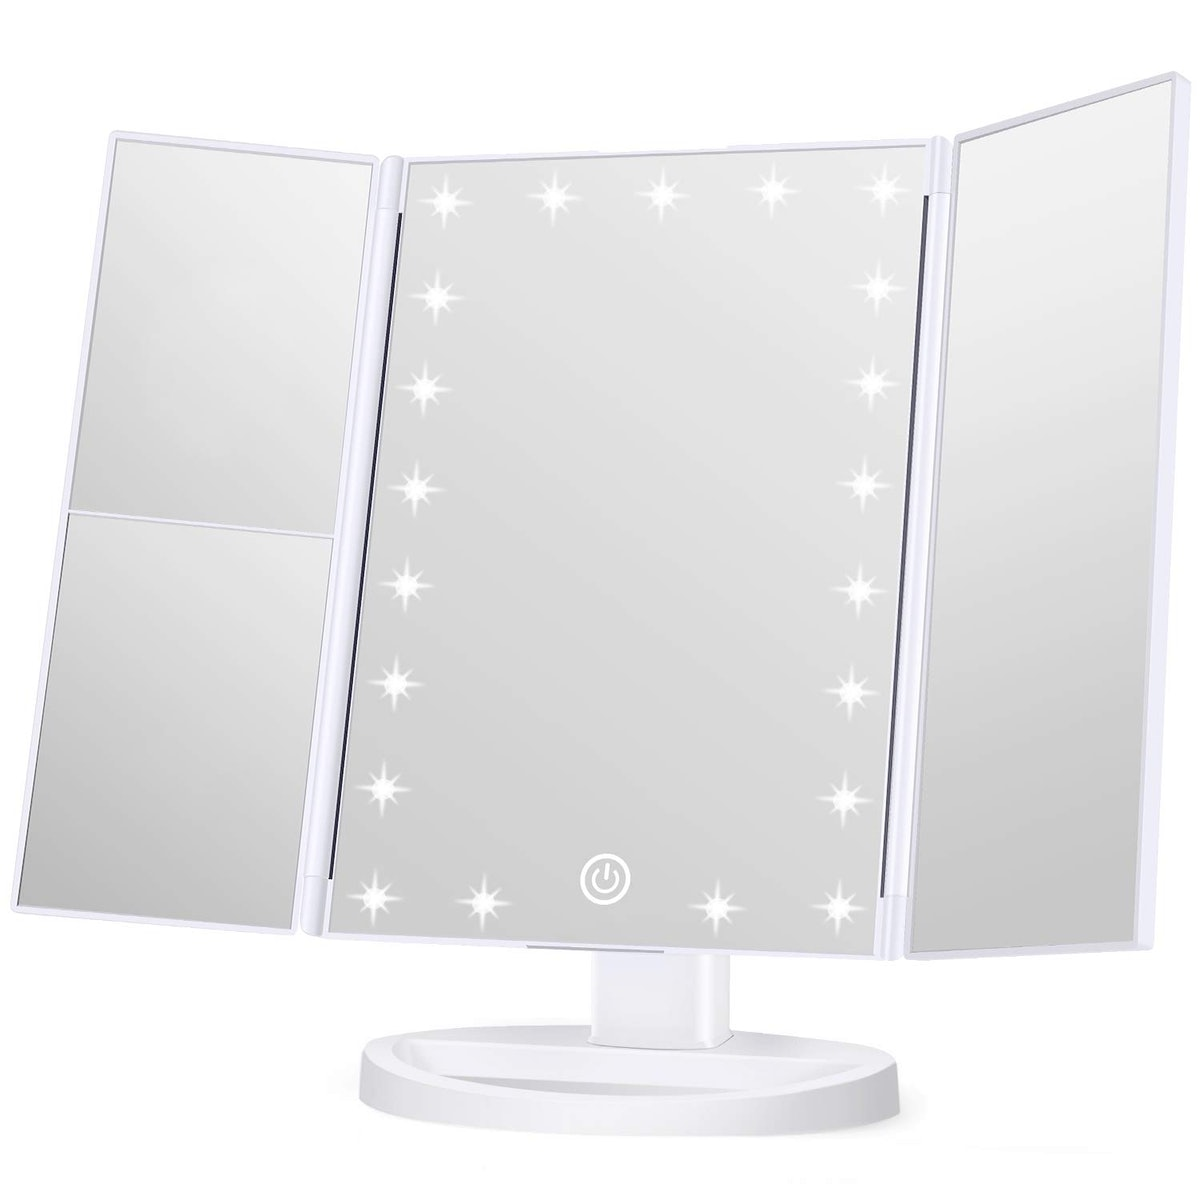 Koolorbs Magnification Mirror